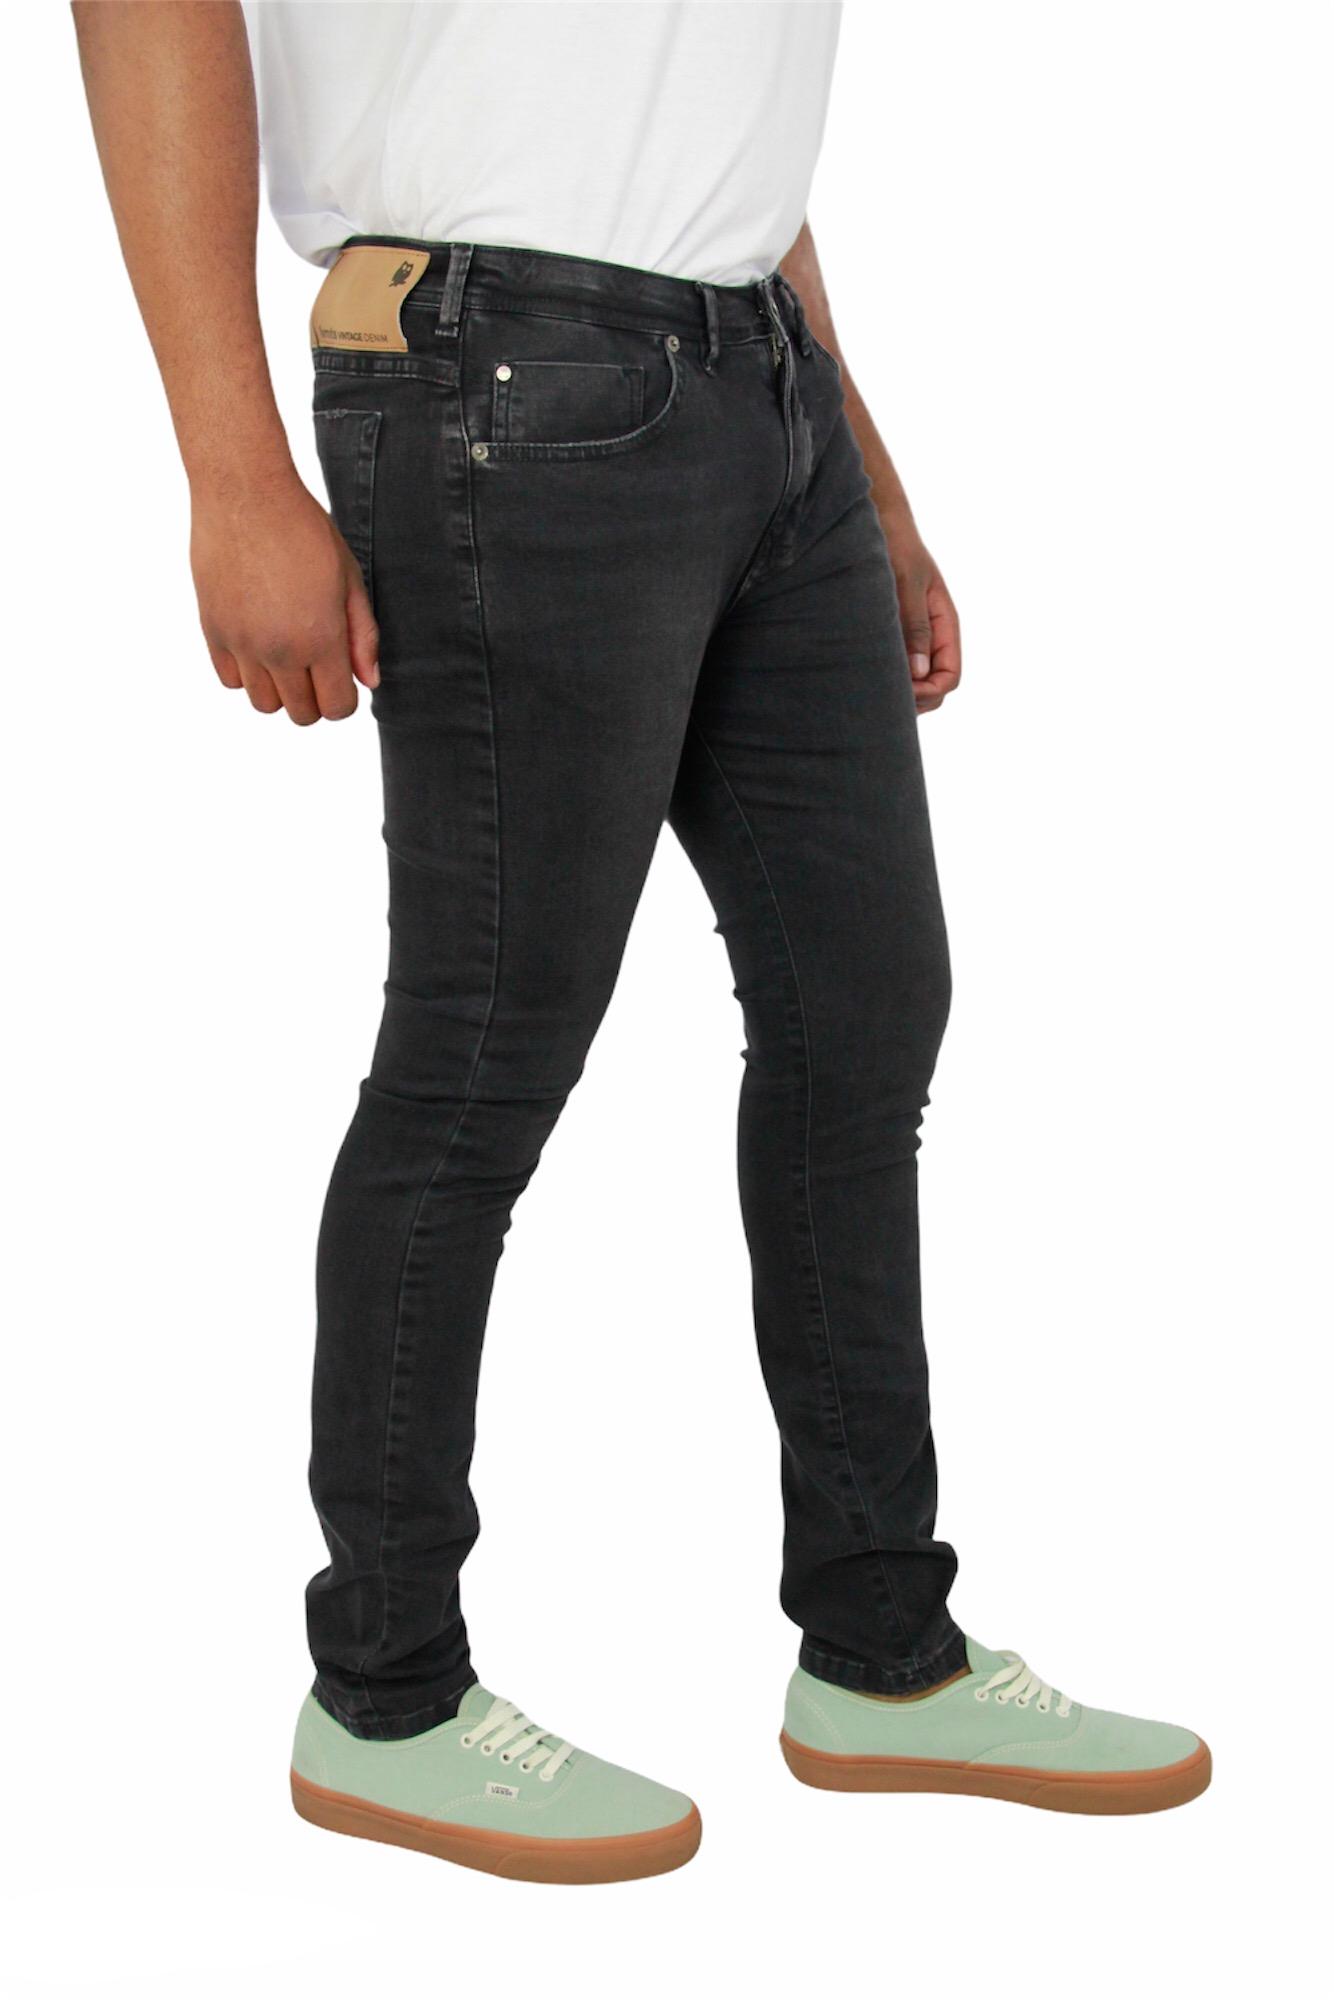 Calça Jeans Black Rock Limits